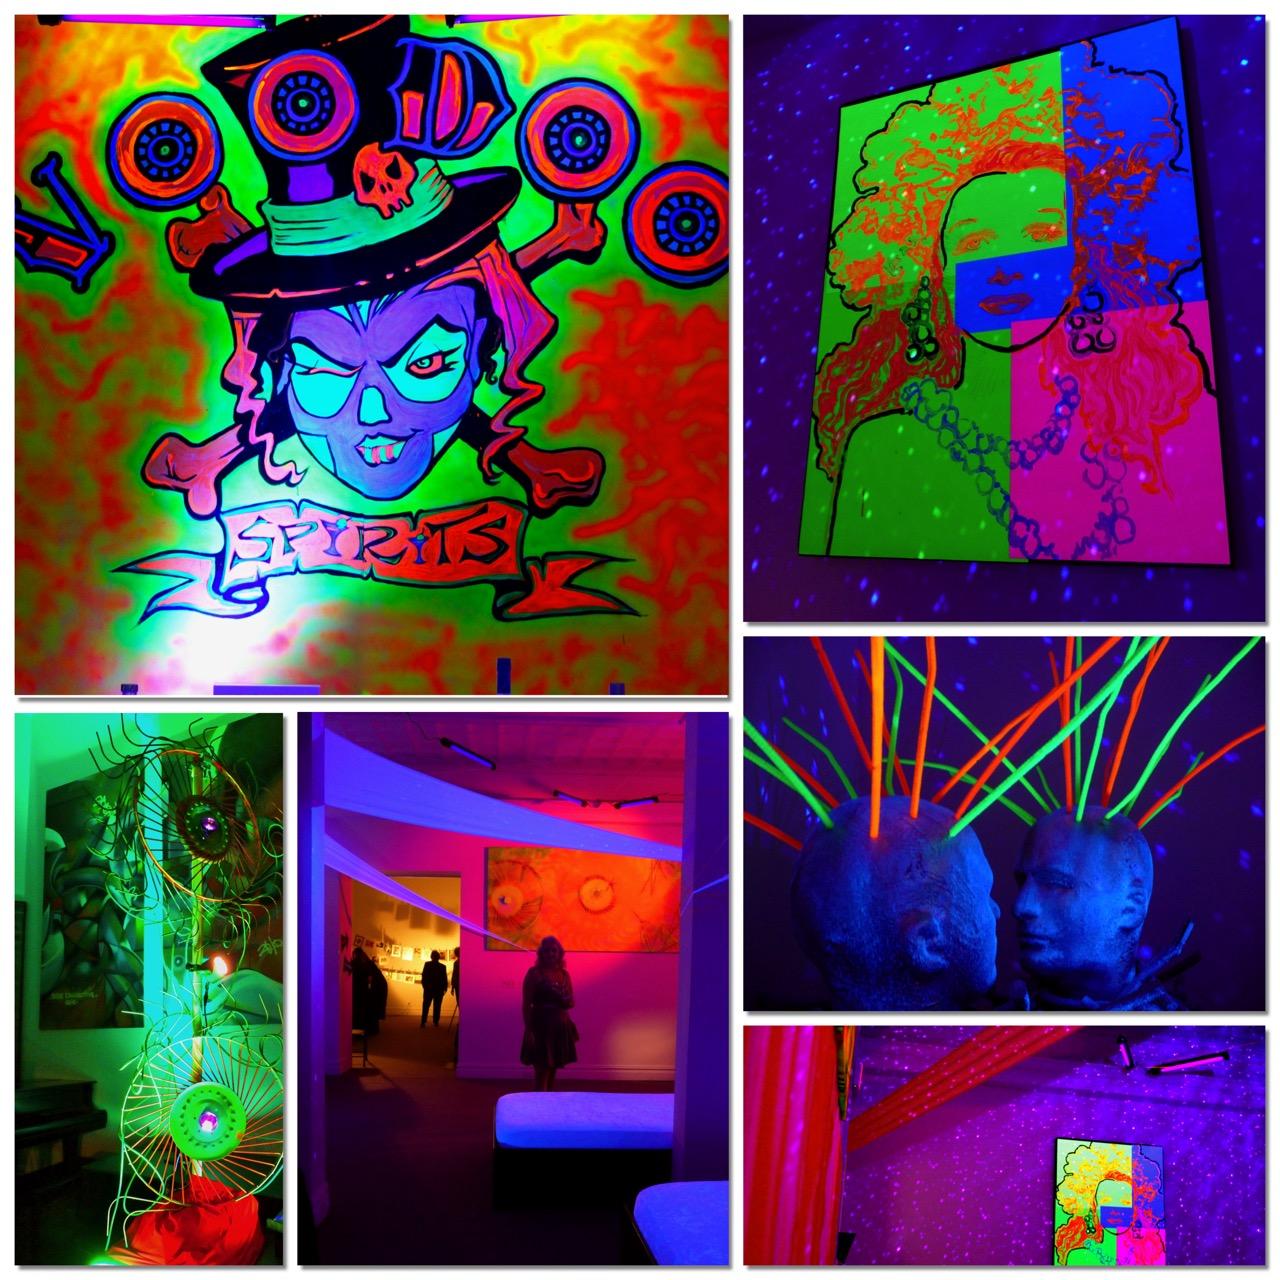 Eggsotic Events Black Light Party Lighting Rental Halloween Glow Party NJ NYC  - 1.jpg